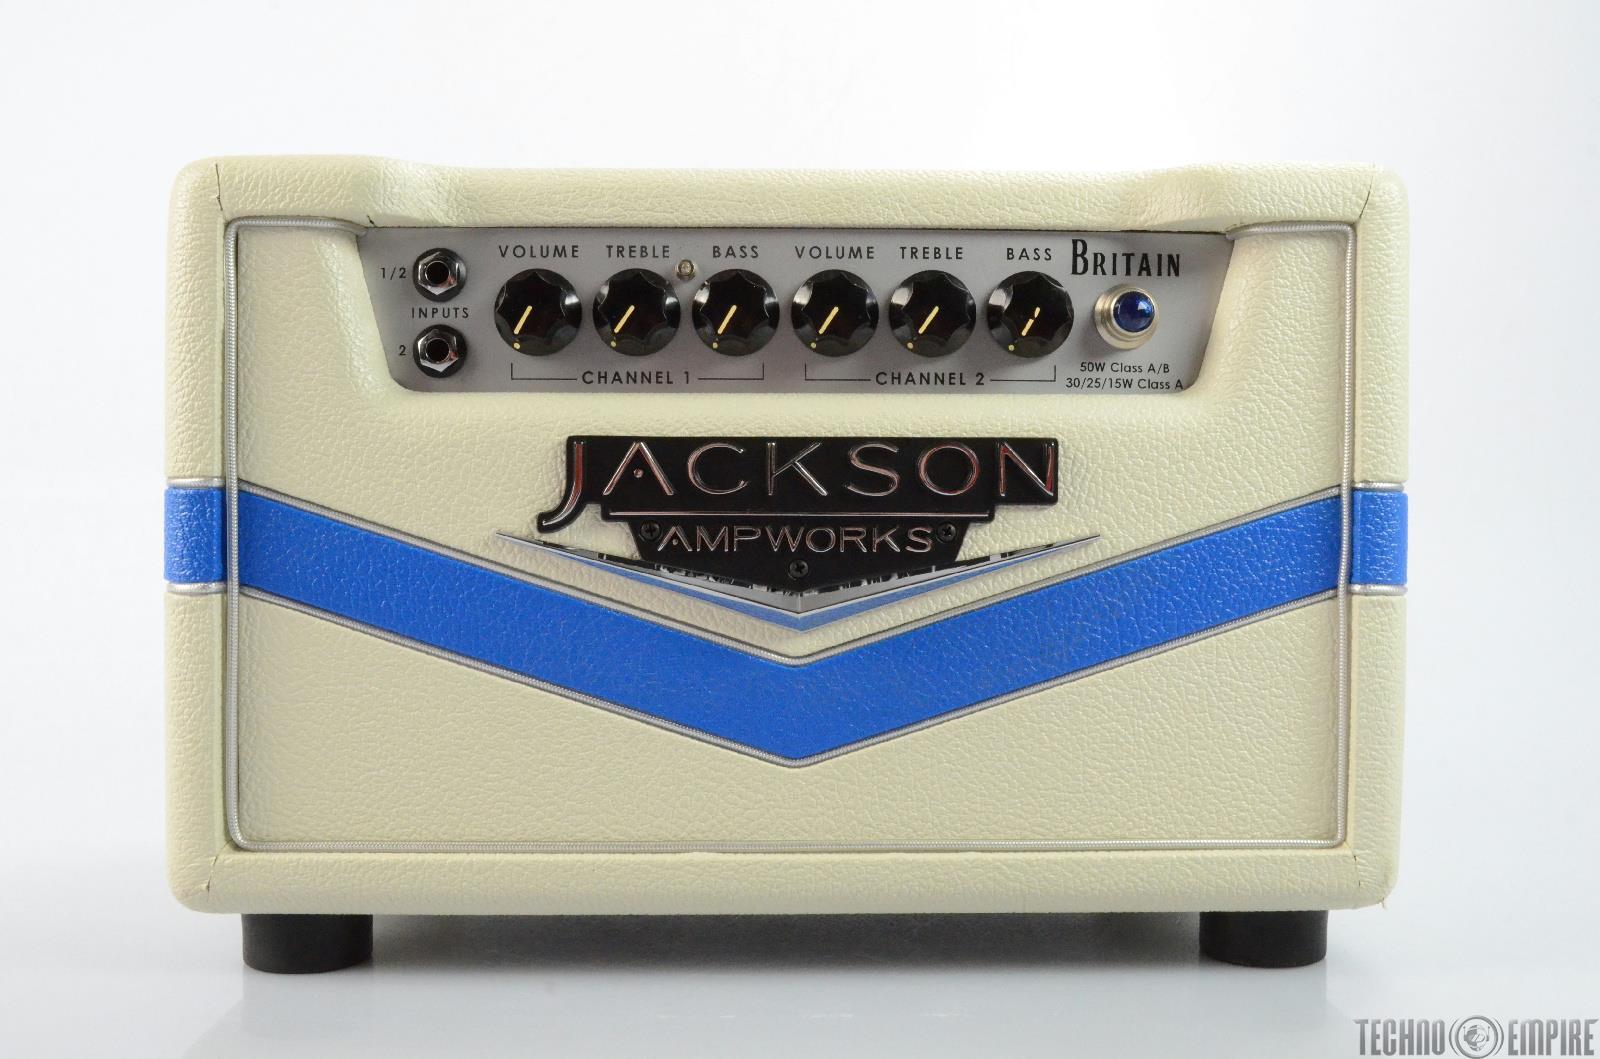 JACKSON AMPWORKS Britain 4.0 Guitar Amplifier Head #26004